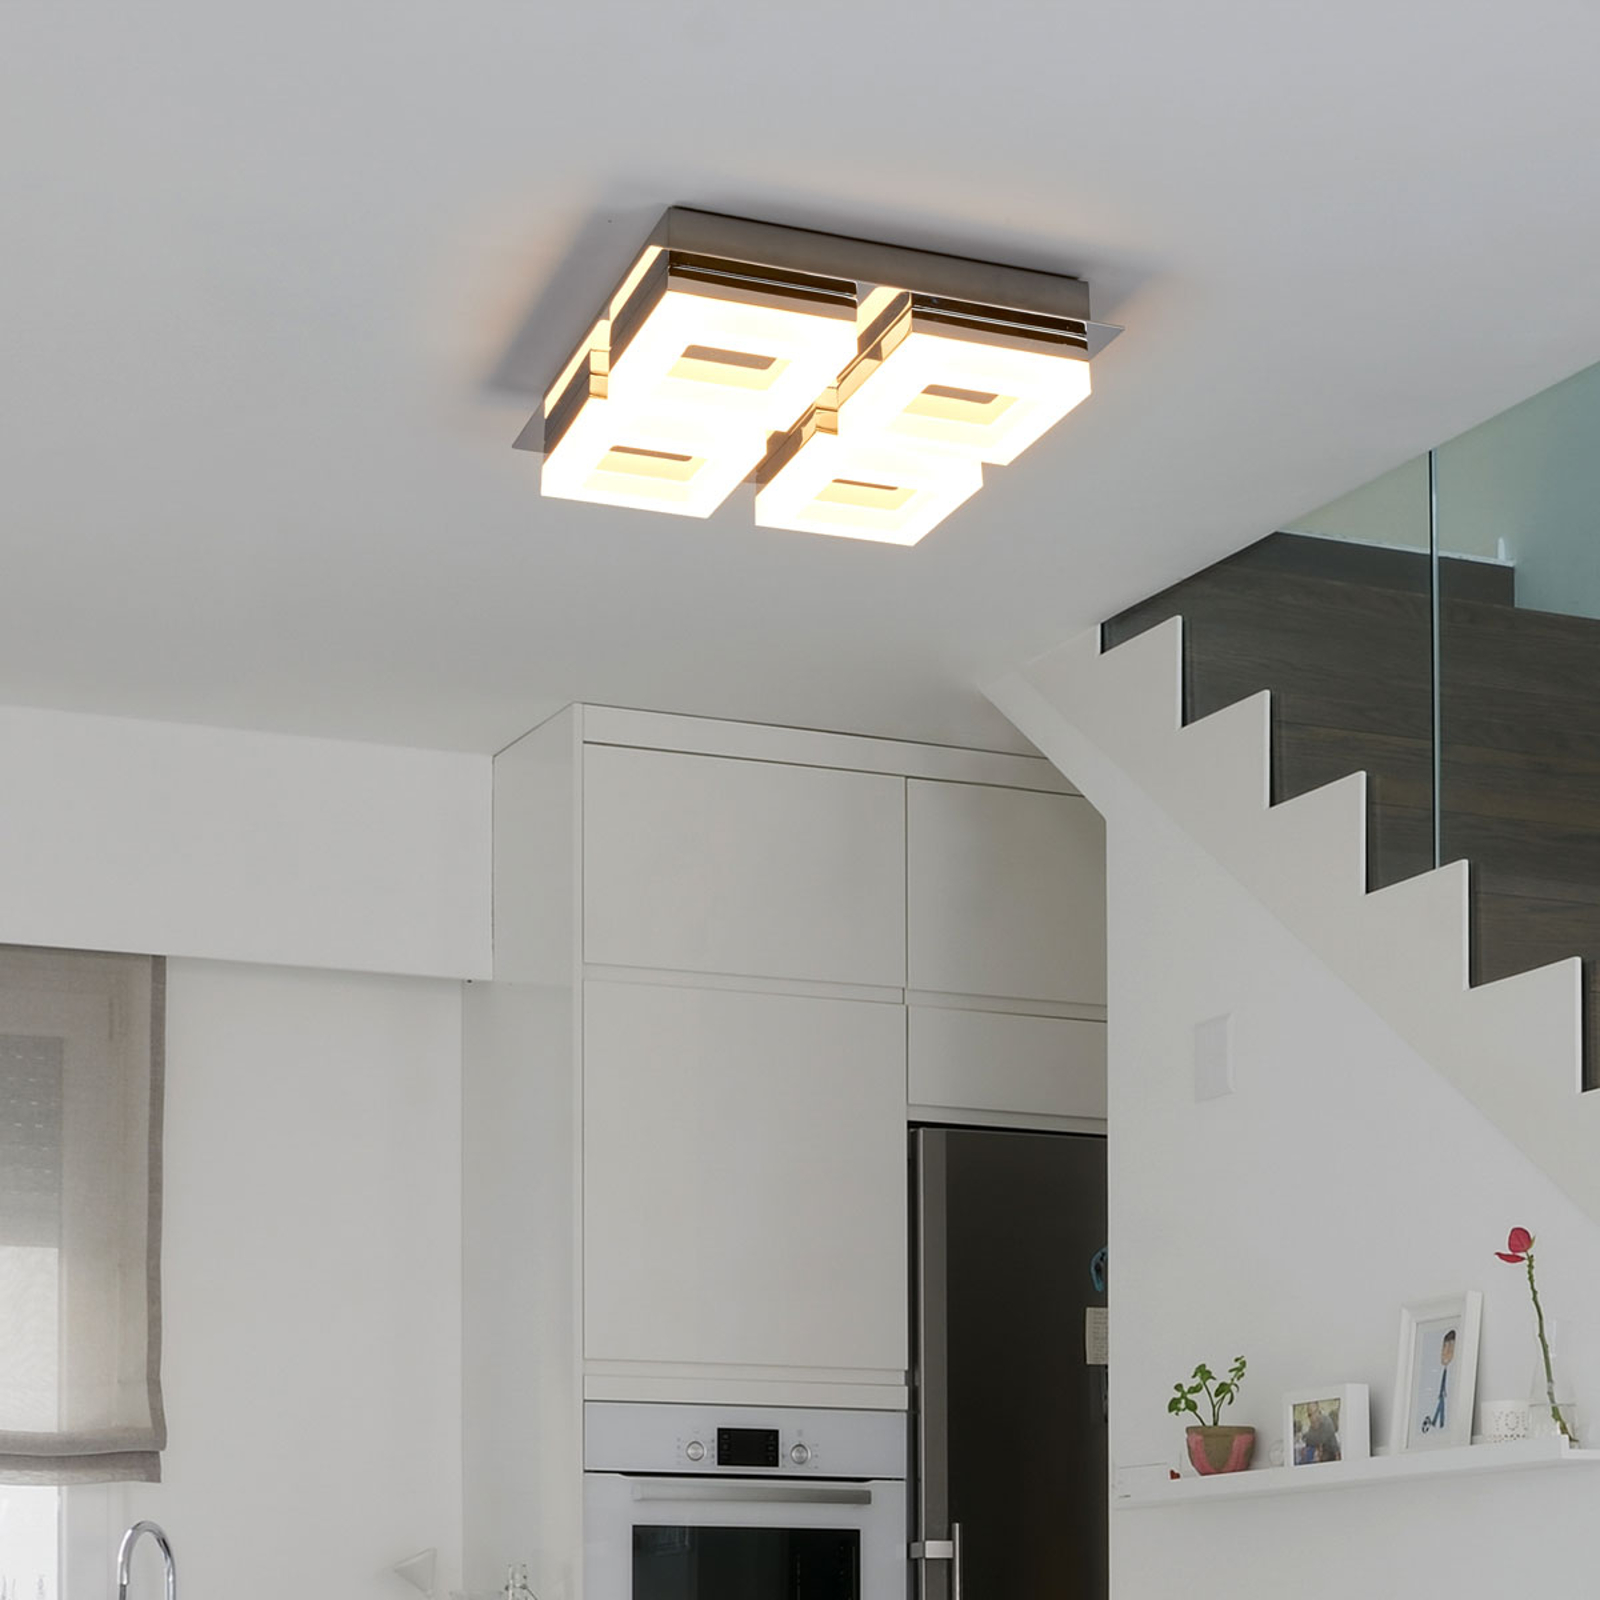 4-punktowa łazienkowa lampa sufitowa LED Marija